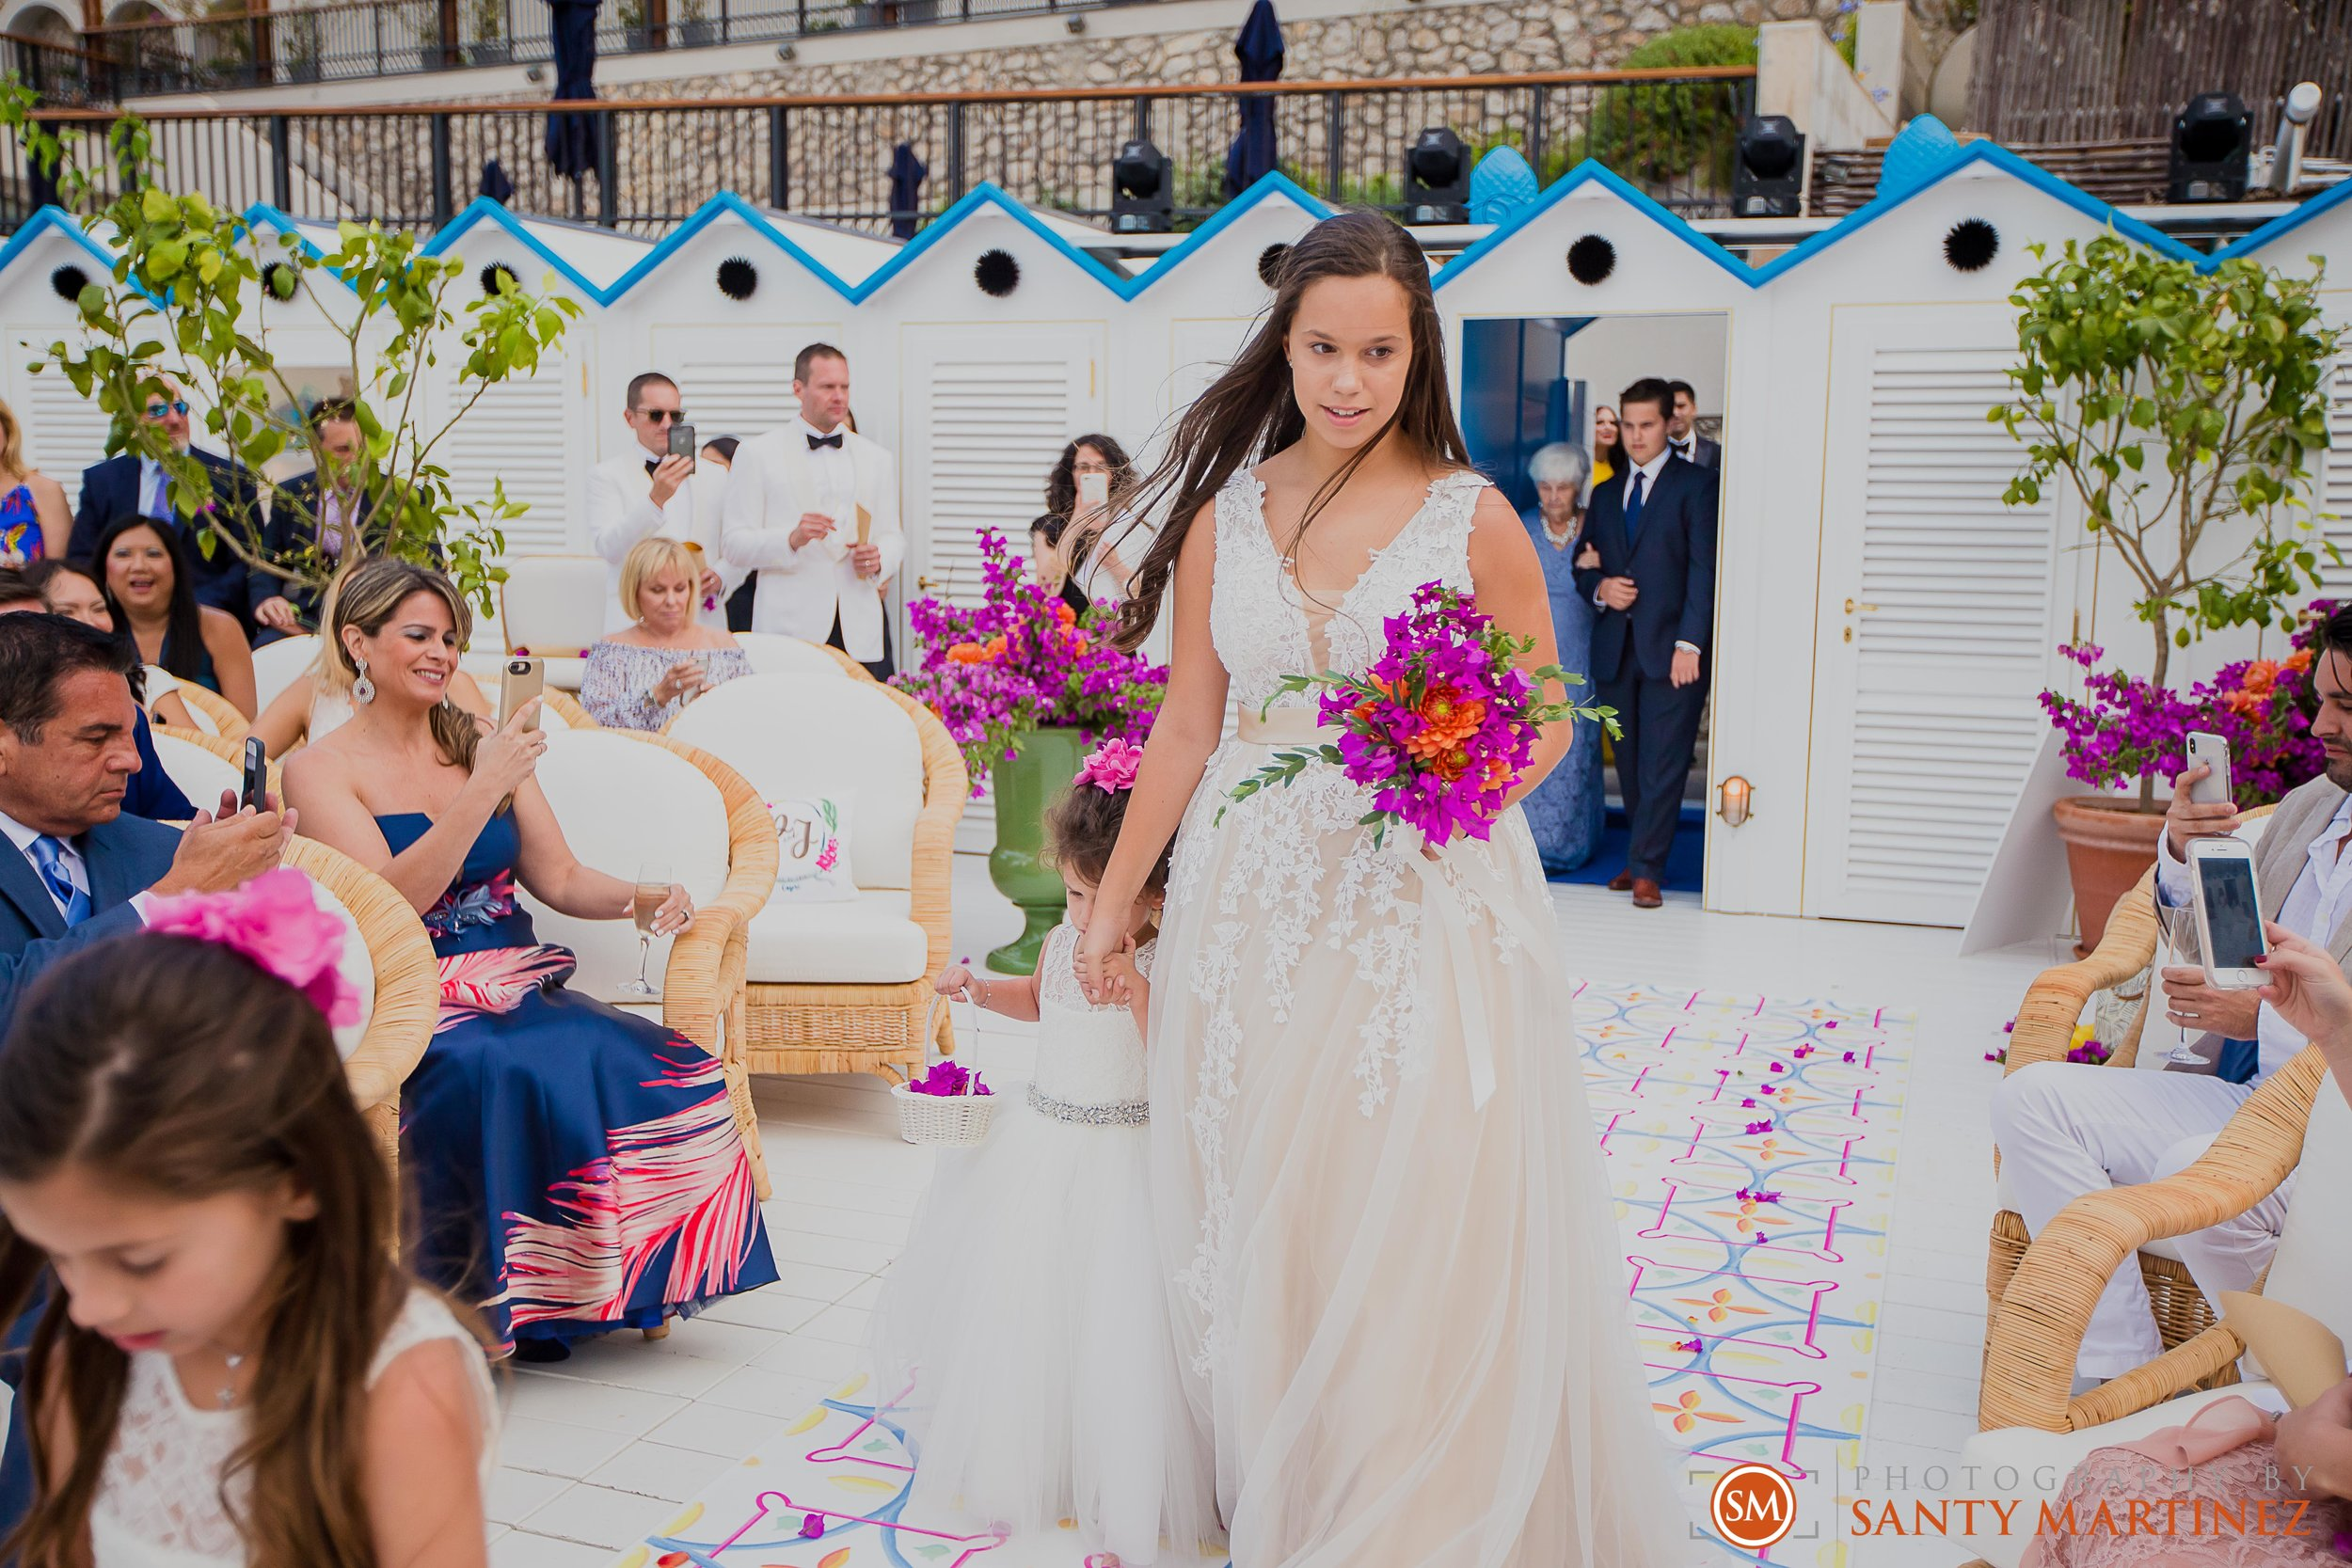 Wedding Capri Italy - Photography by Santy Martinez-46.jpg